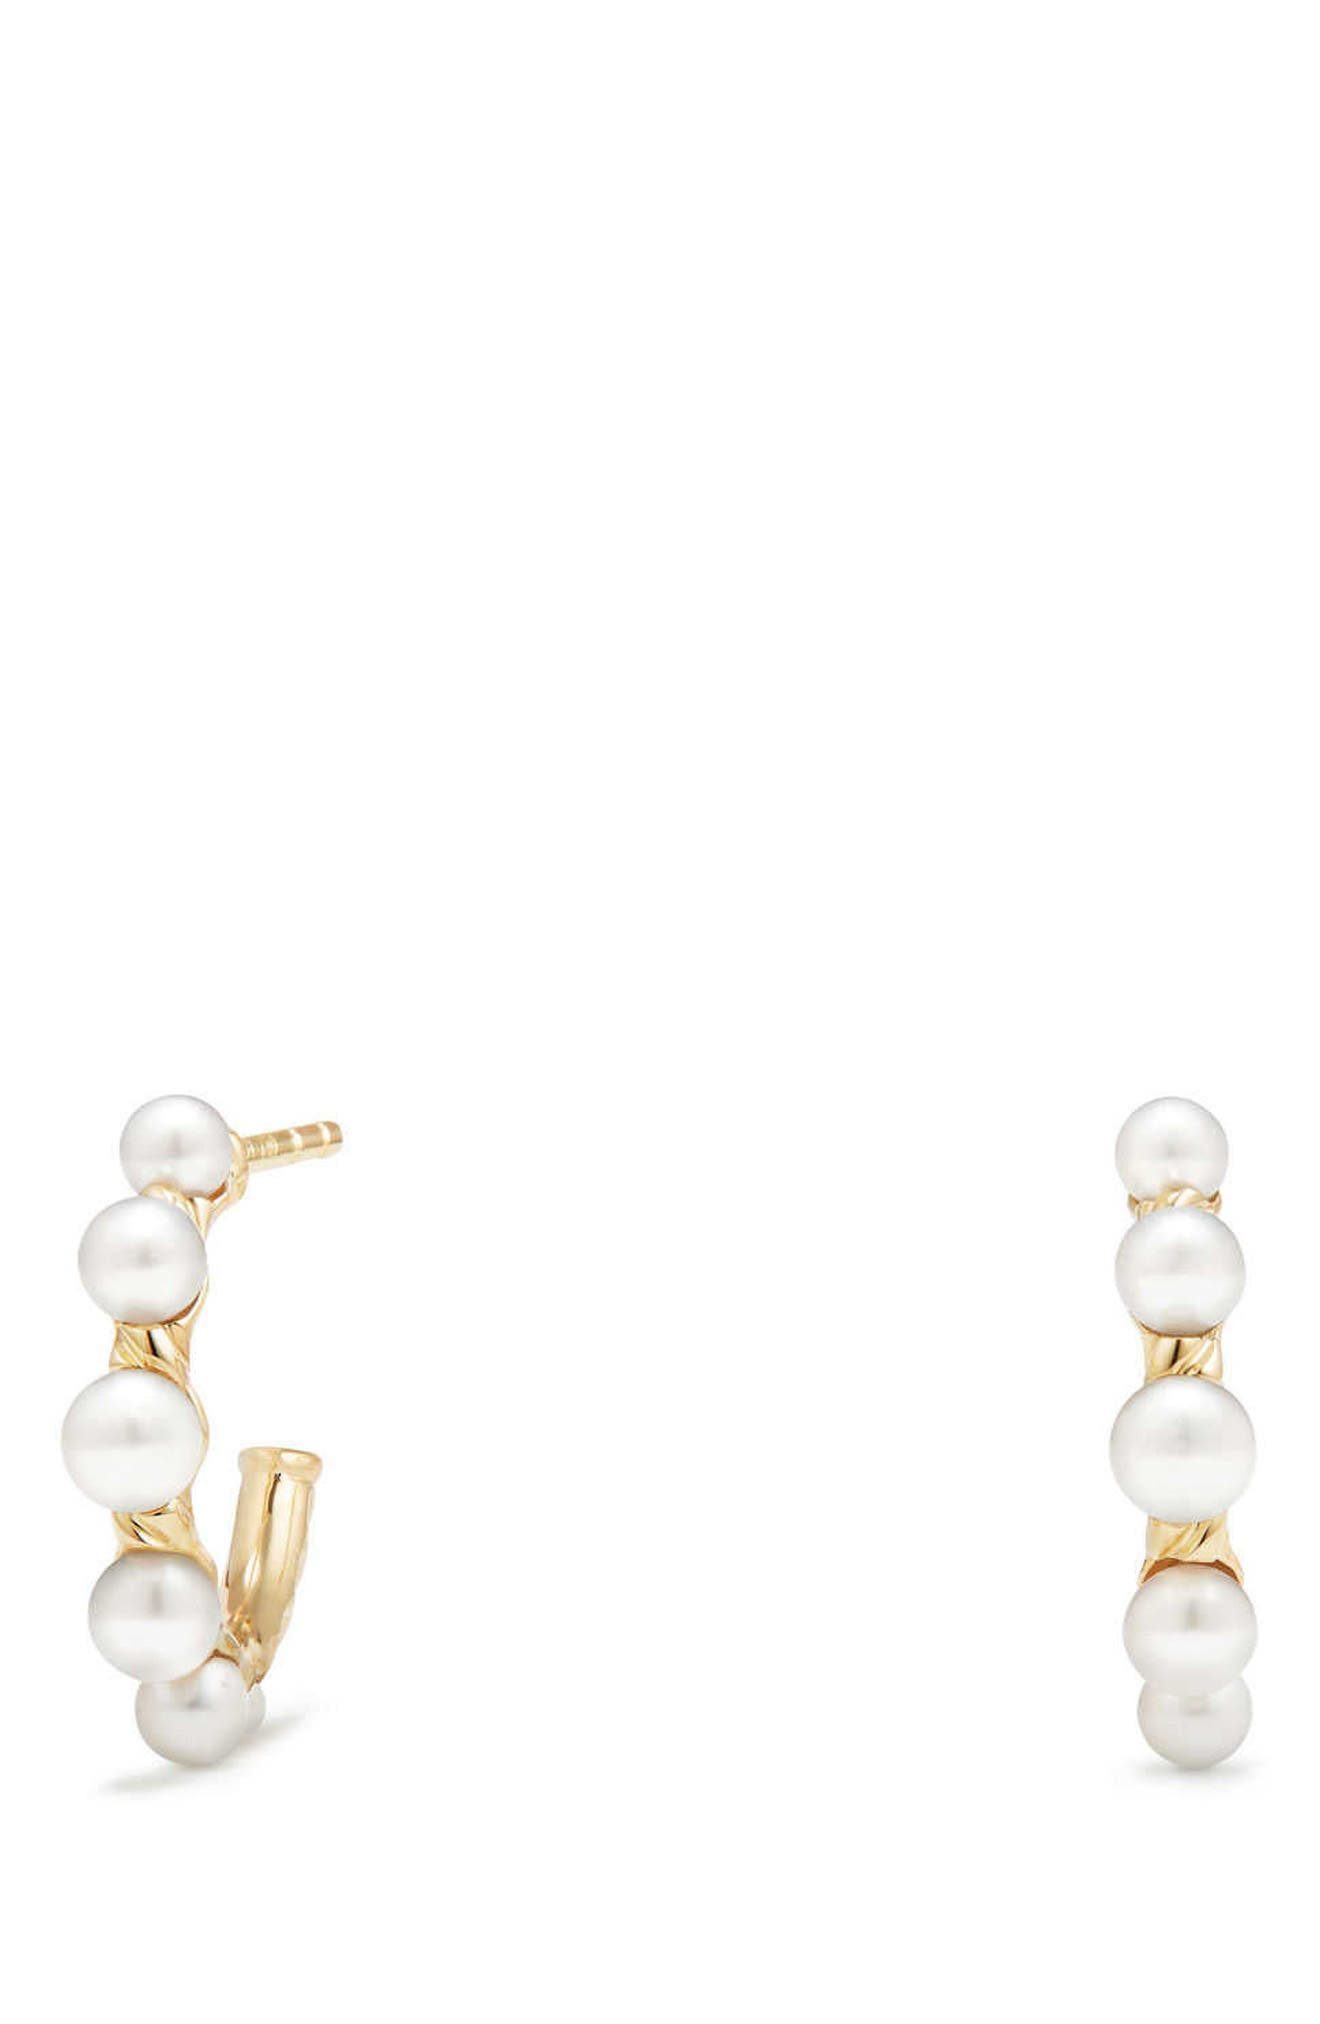 Alternate Image 2  - David Yurman Petite Perle Graduated Pearl Hoop Earrings in 18K Gold